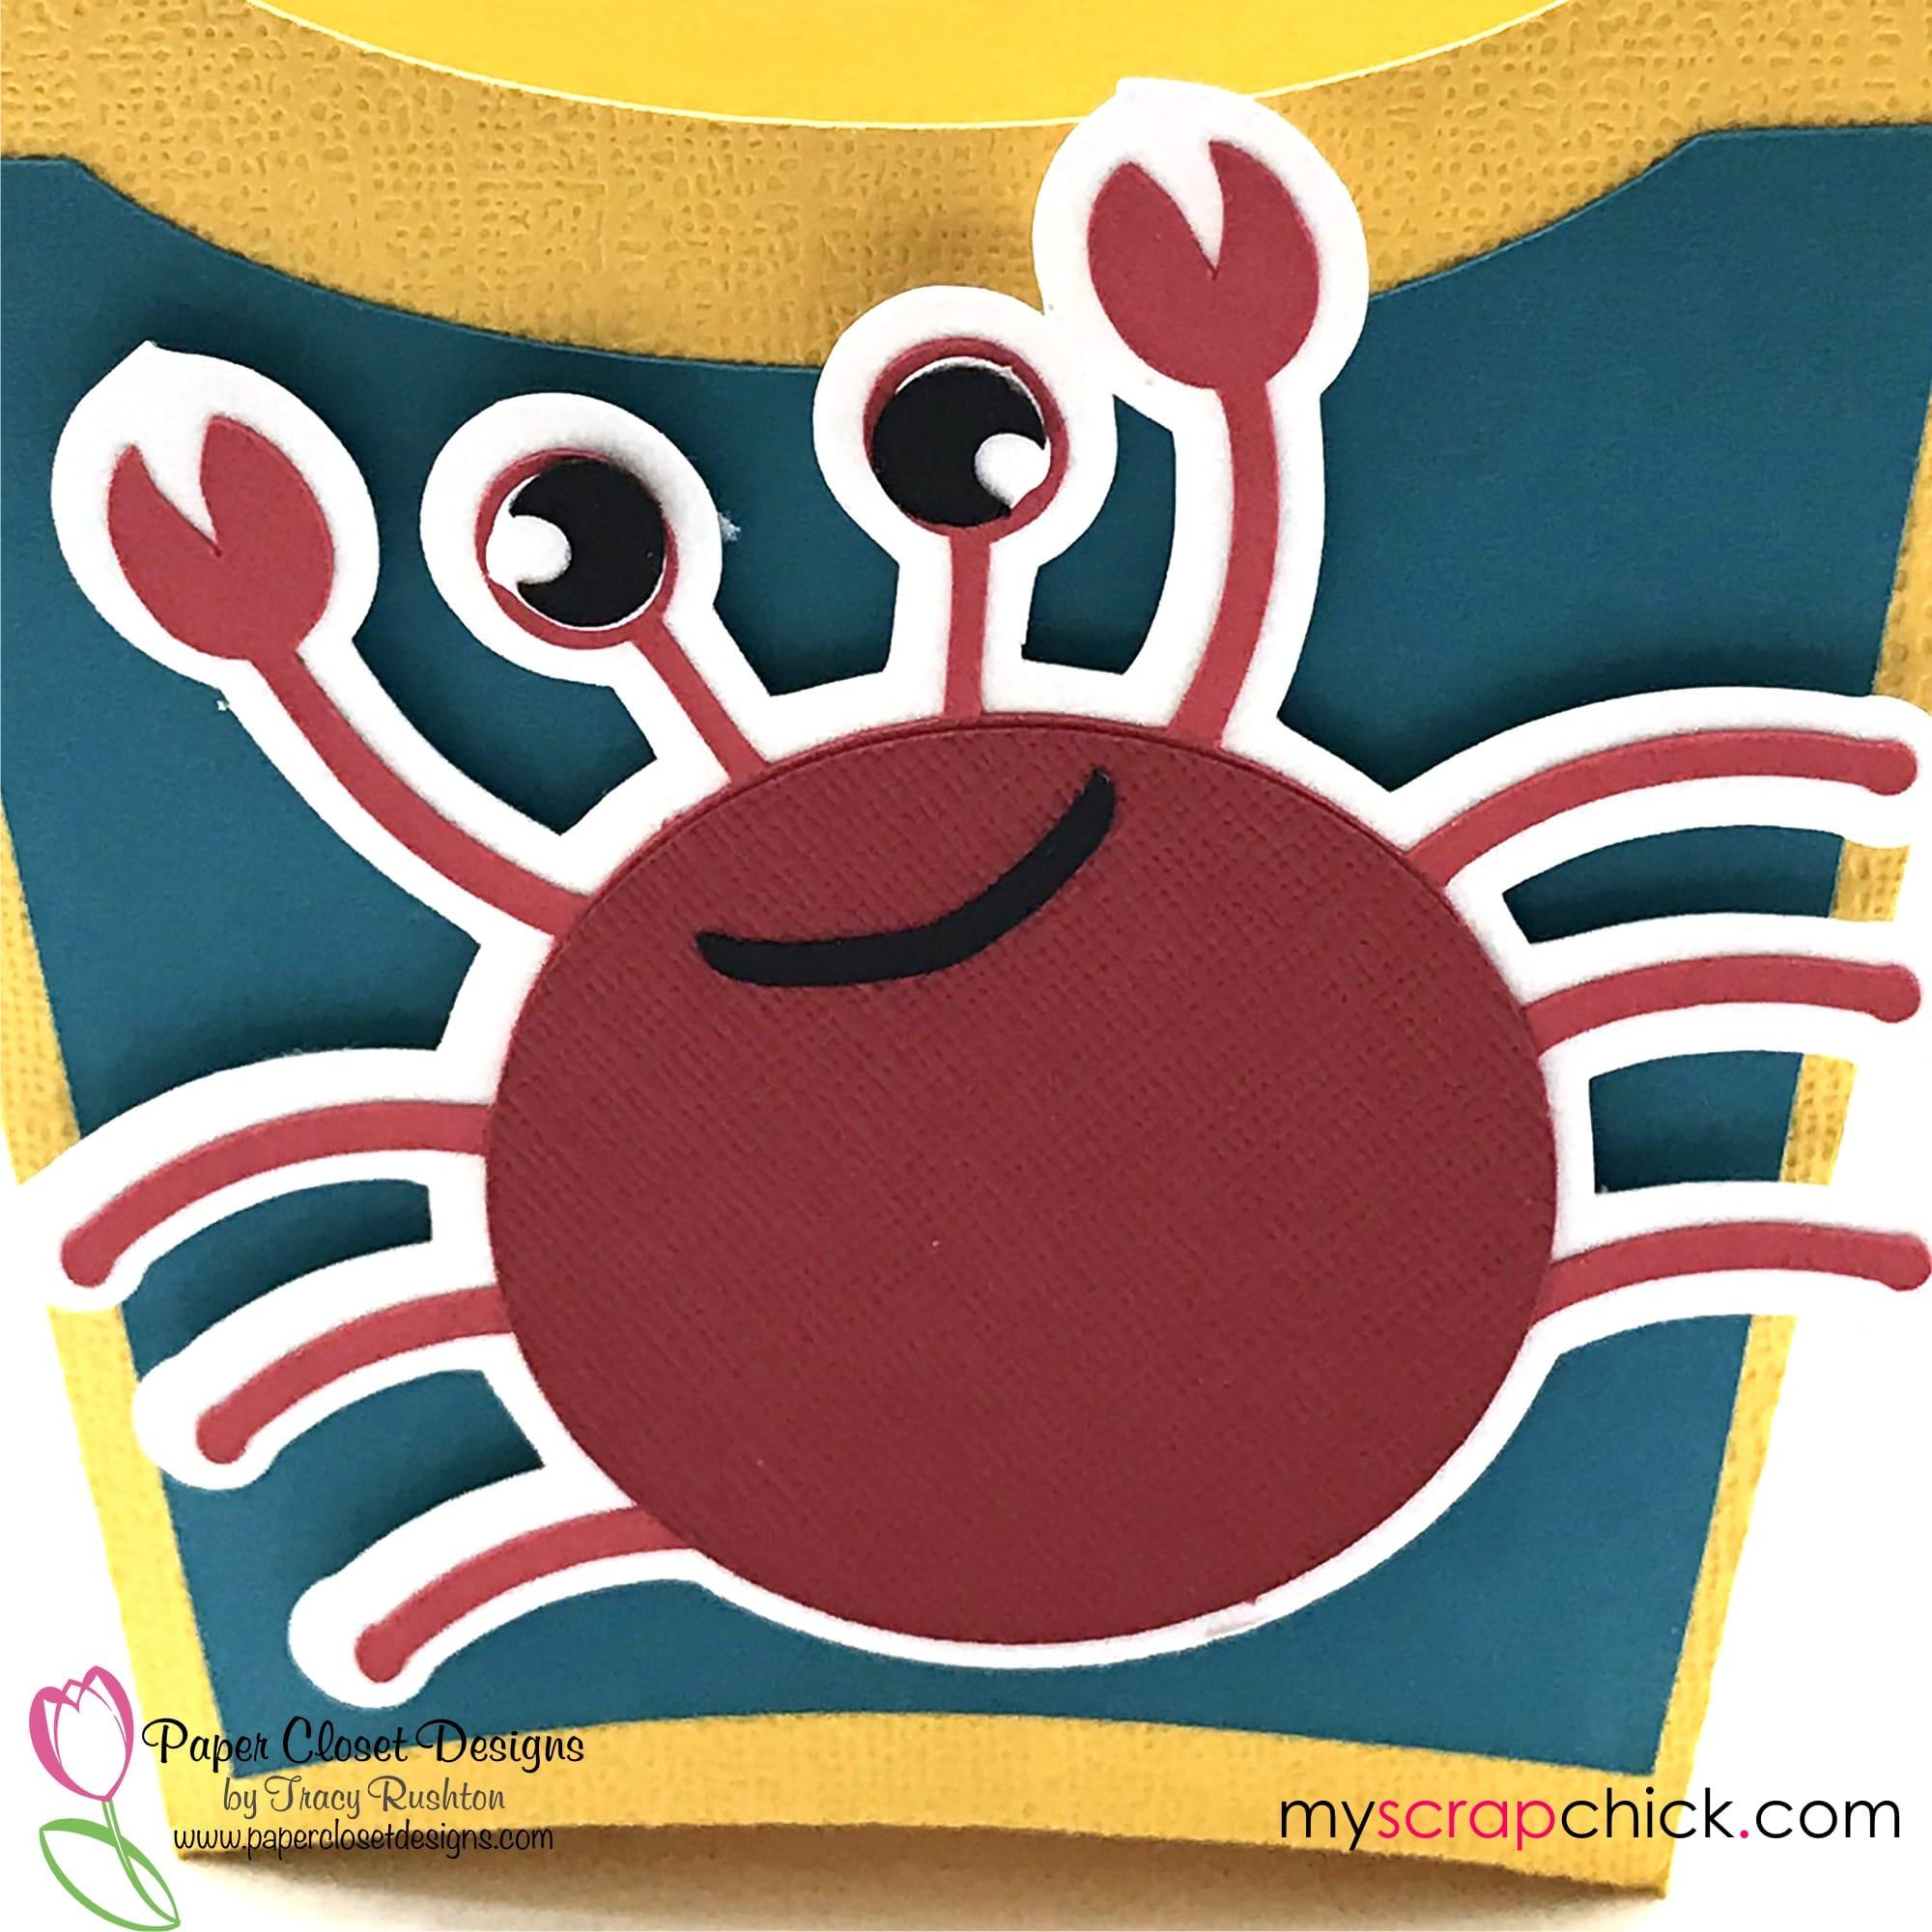 Beach Bag with Crab 3D SVG, Cricut, Silhouette Cameo Files, DXF, GSD, PDF_up Close